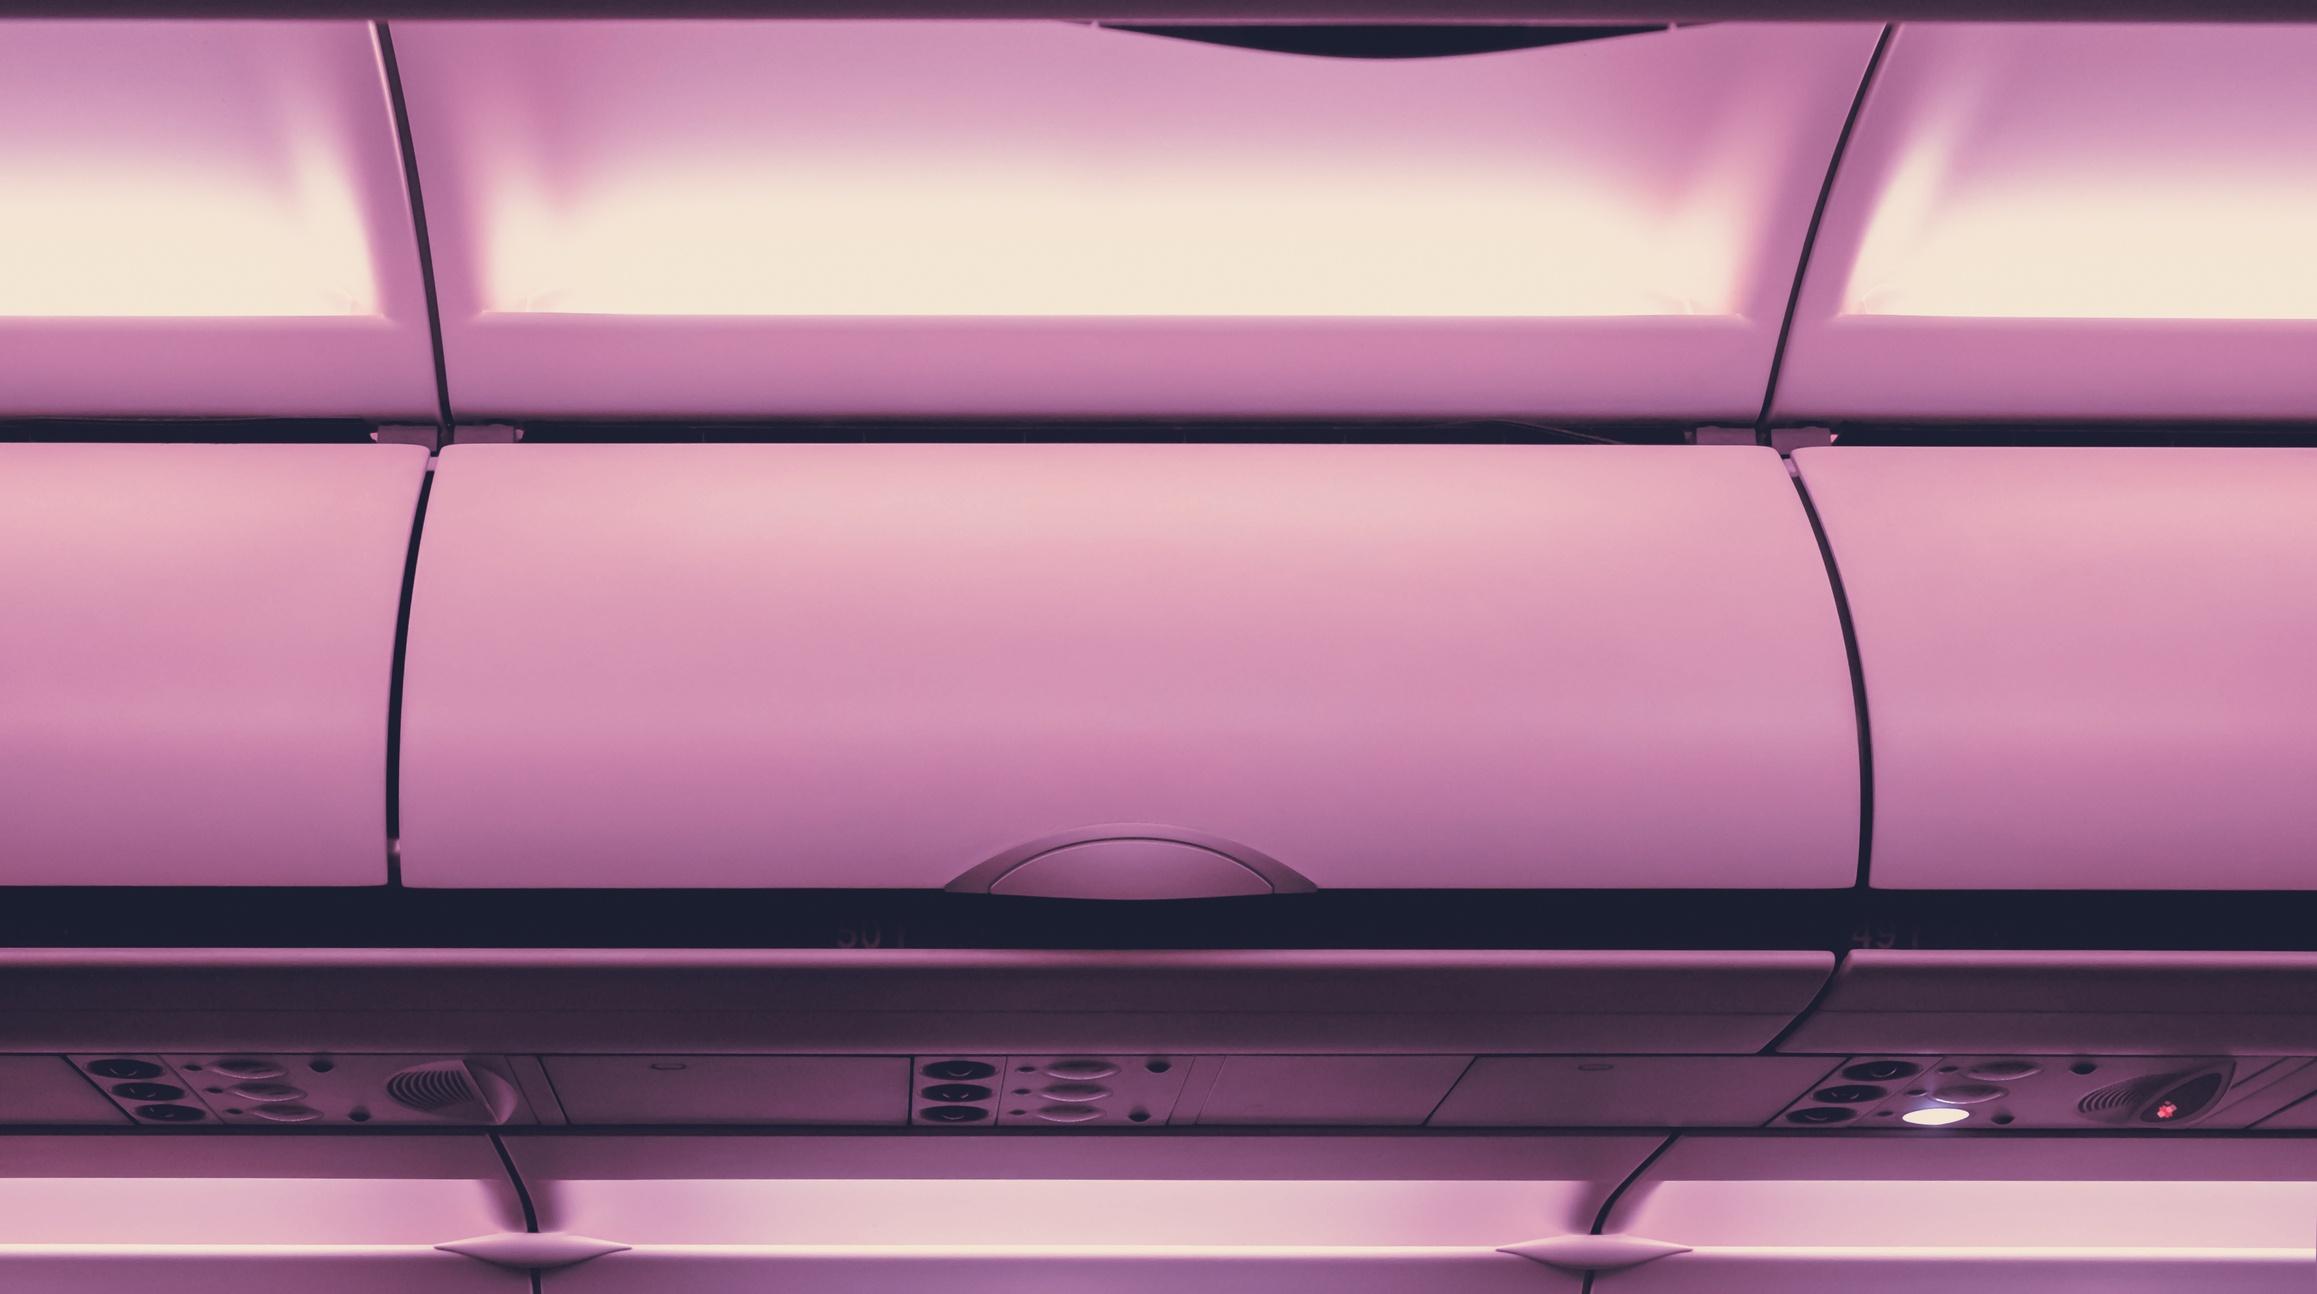 Close overhead bin of airplane with purple cast